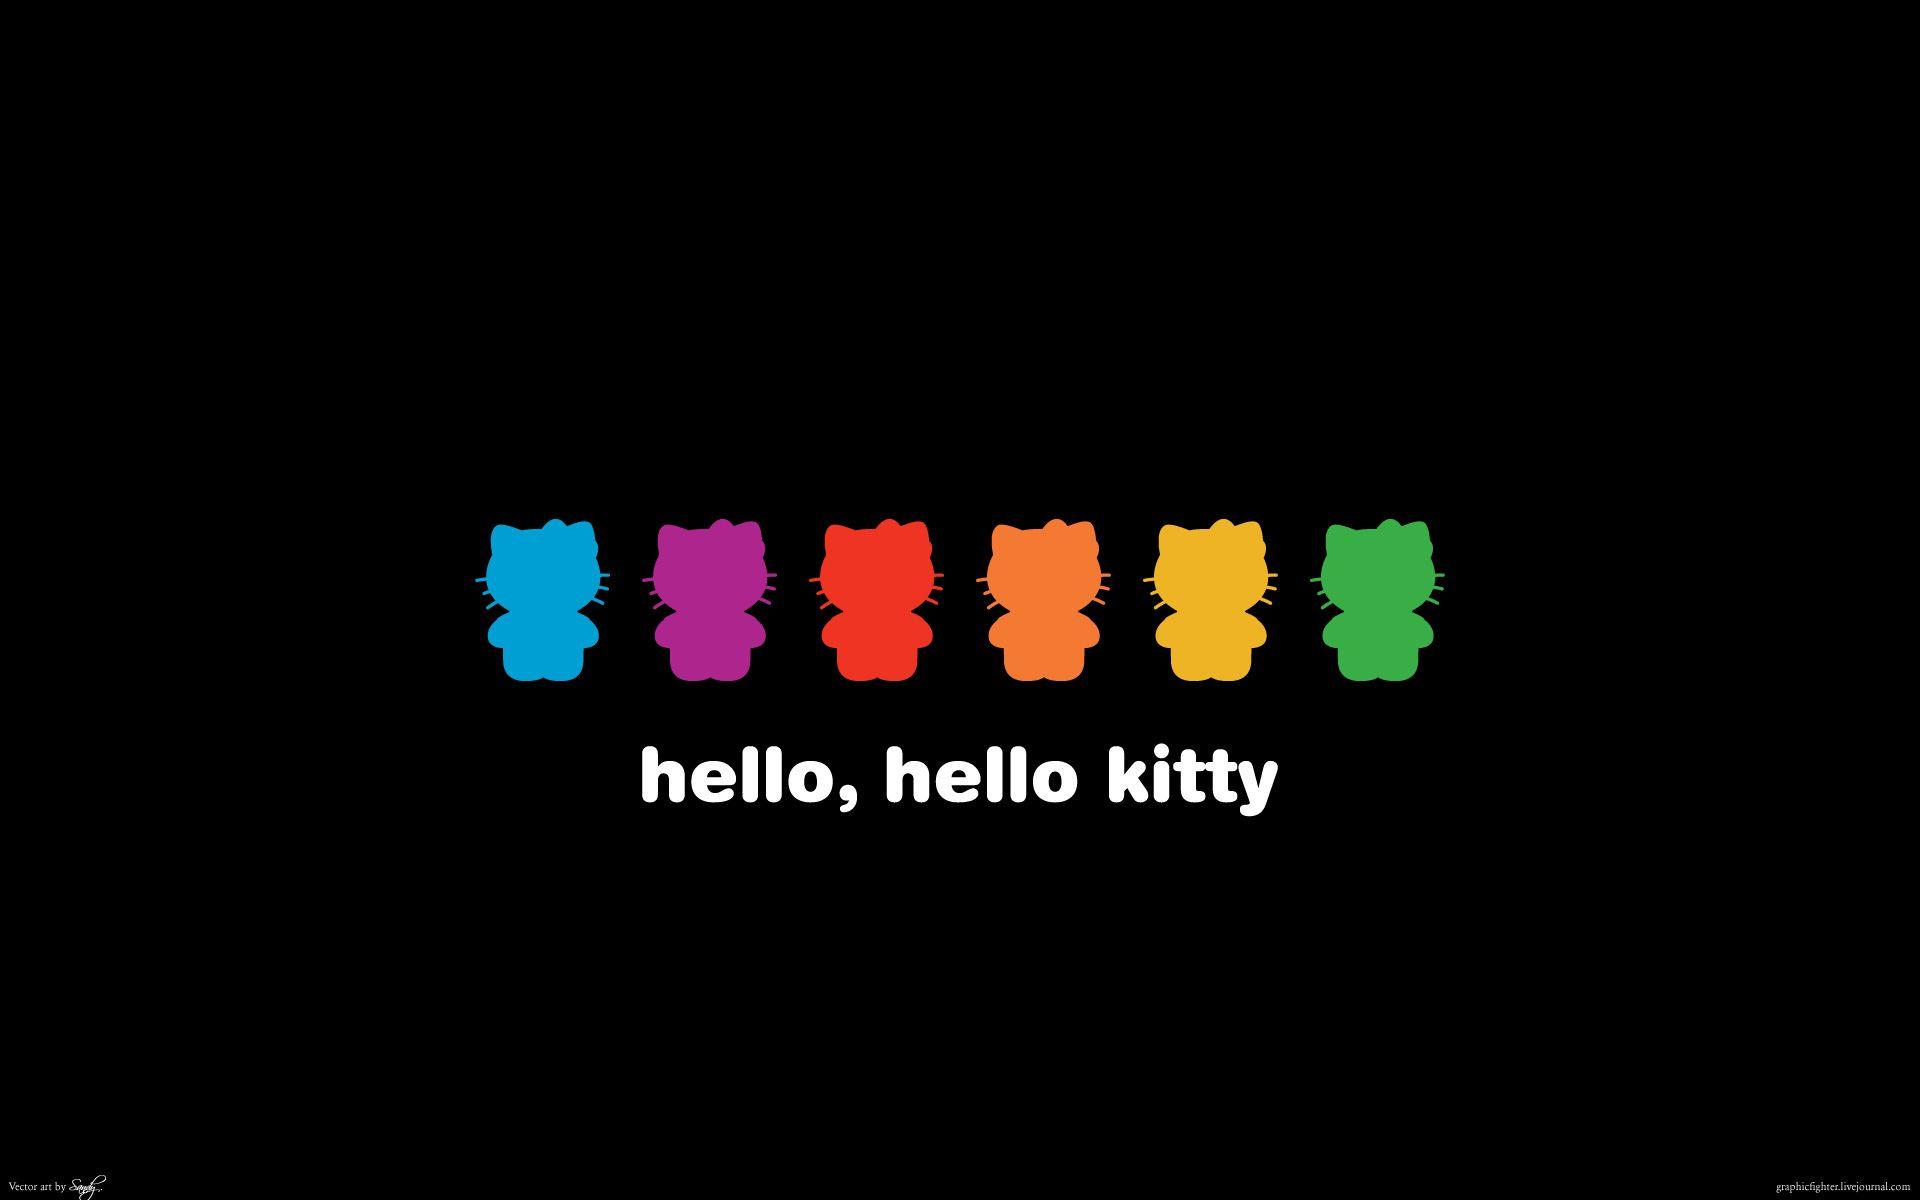 Hello kitty images hello kitty hd wallpaper and background - Wallpaper Hello Kitty